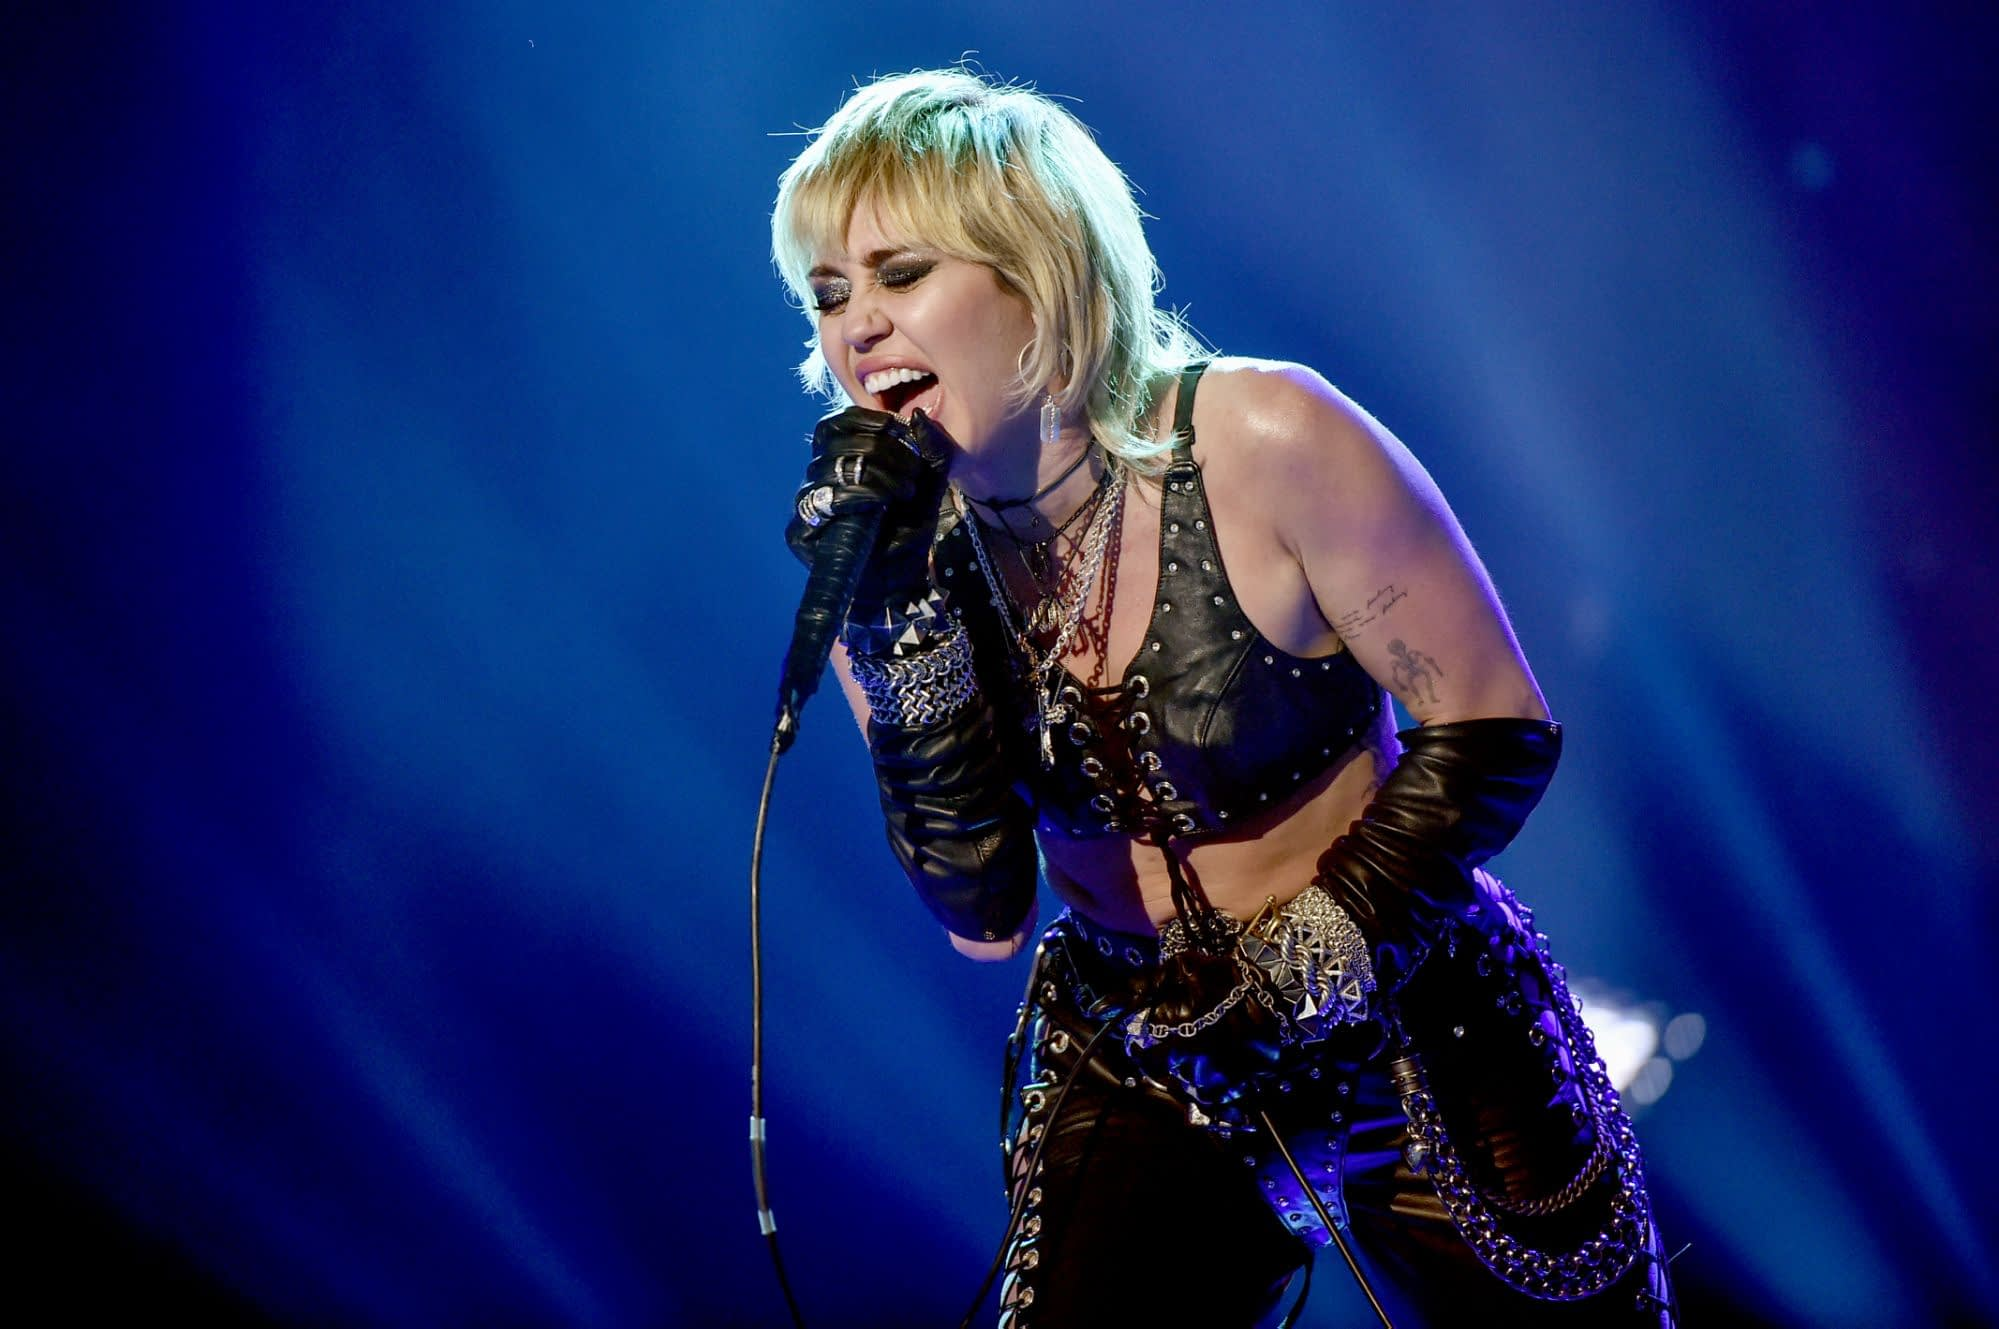 Miley Cyrus says playing Hannah Montana triggered an identity crisis - Yahoo Entertainment